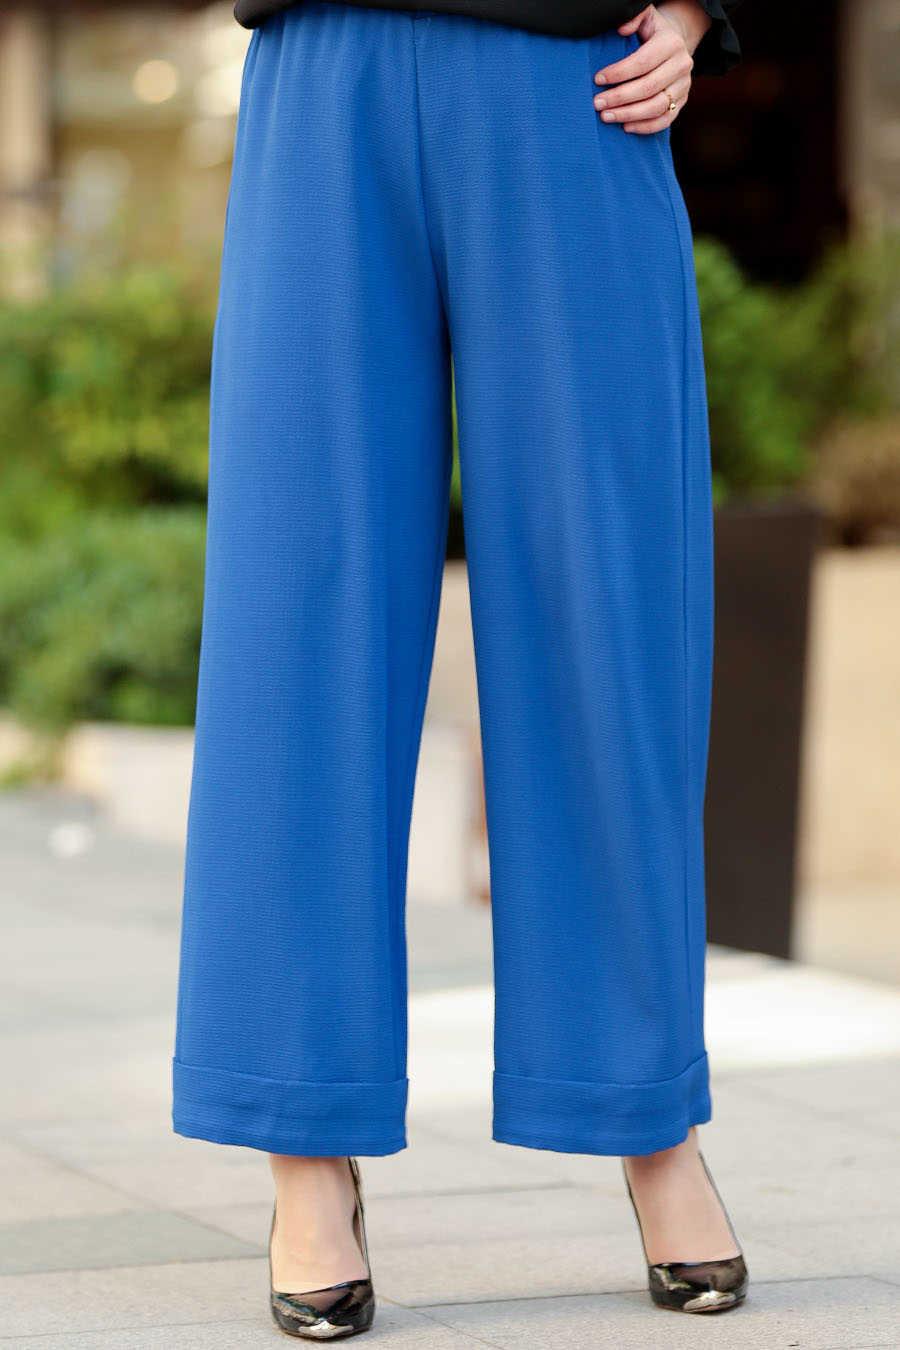 Neva Style - Sax Blue Hijab Pants 8122SX